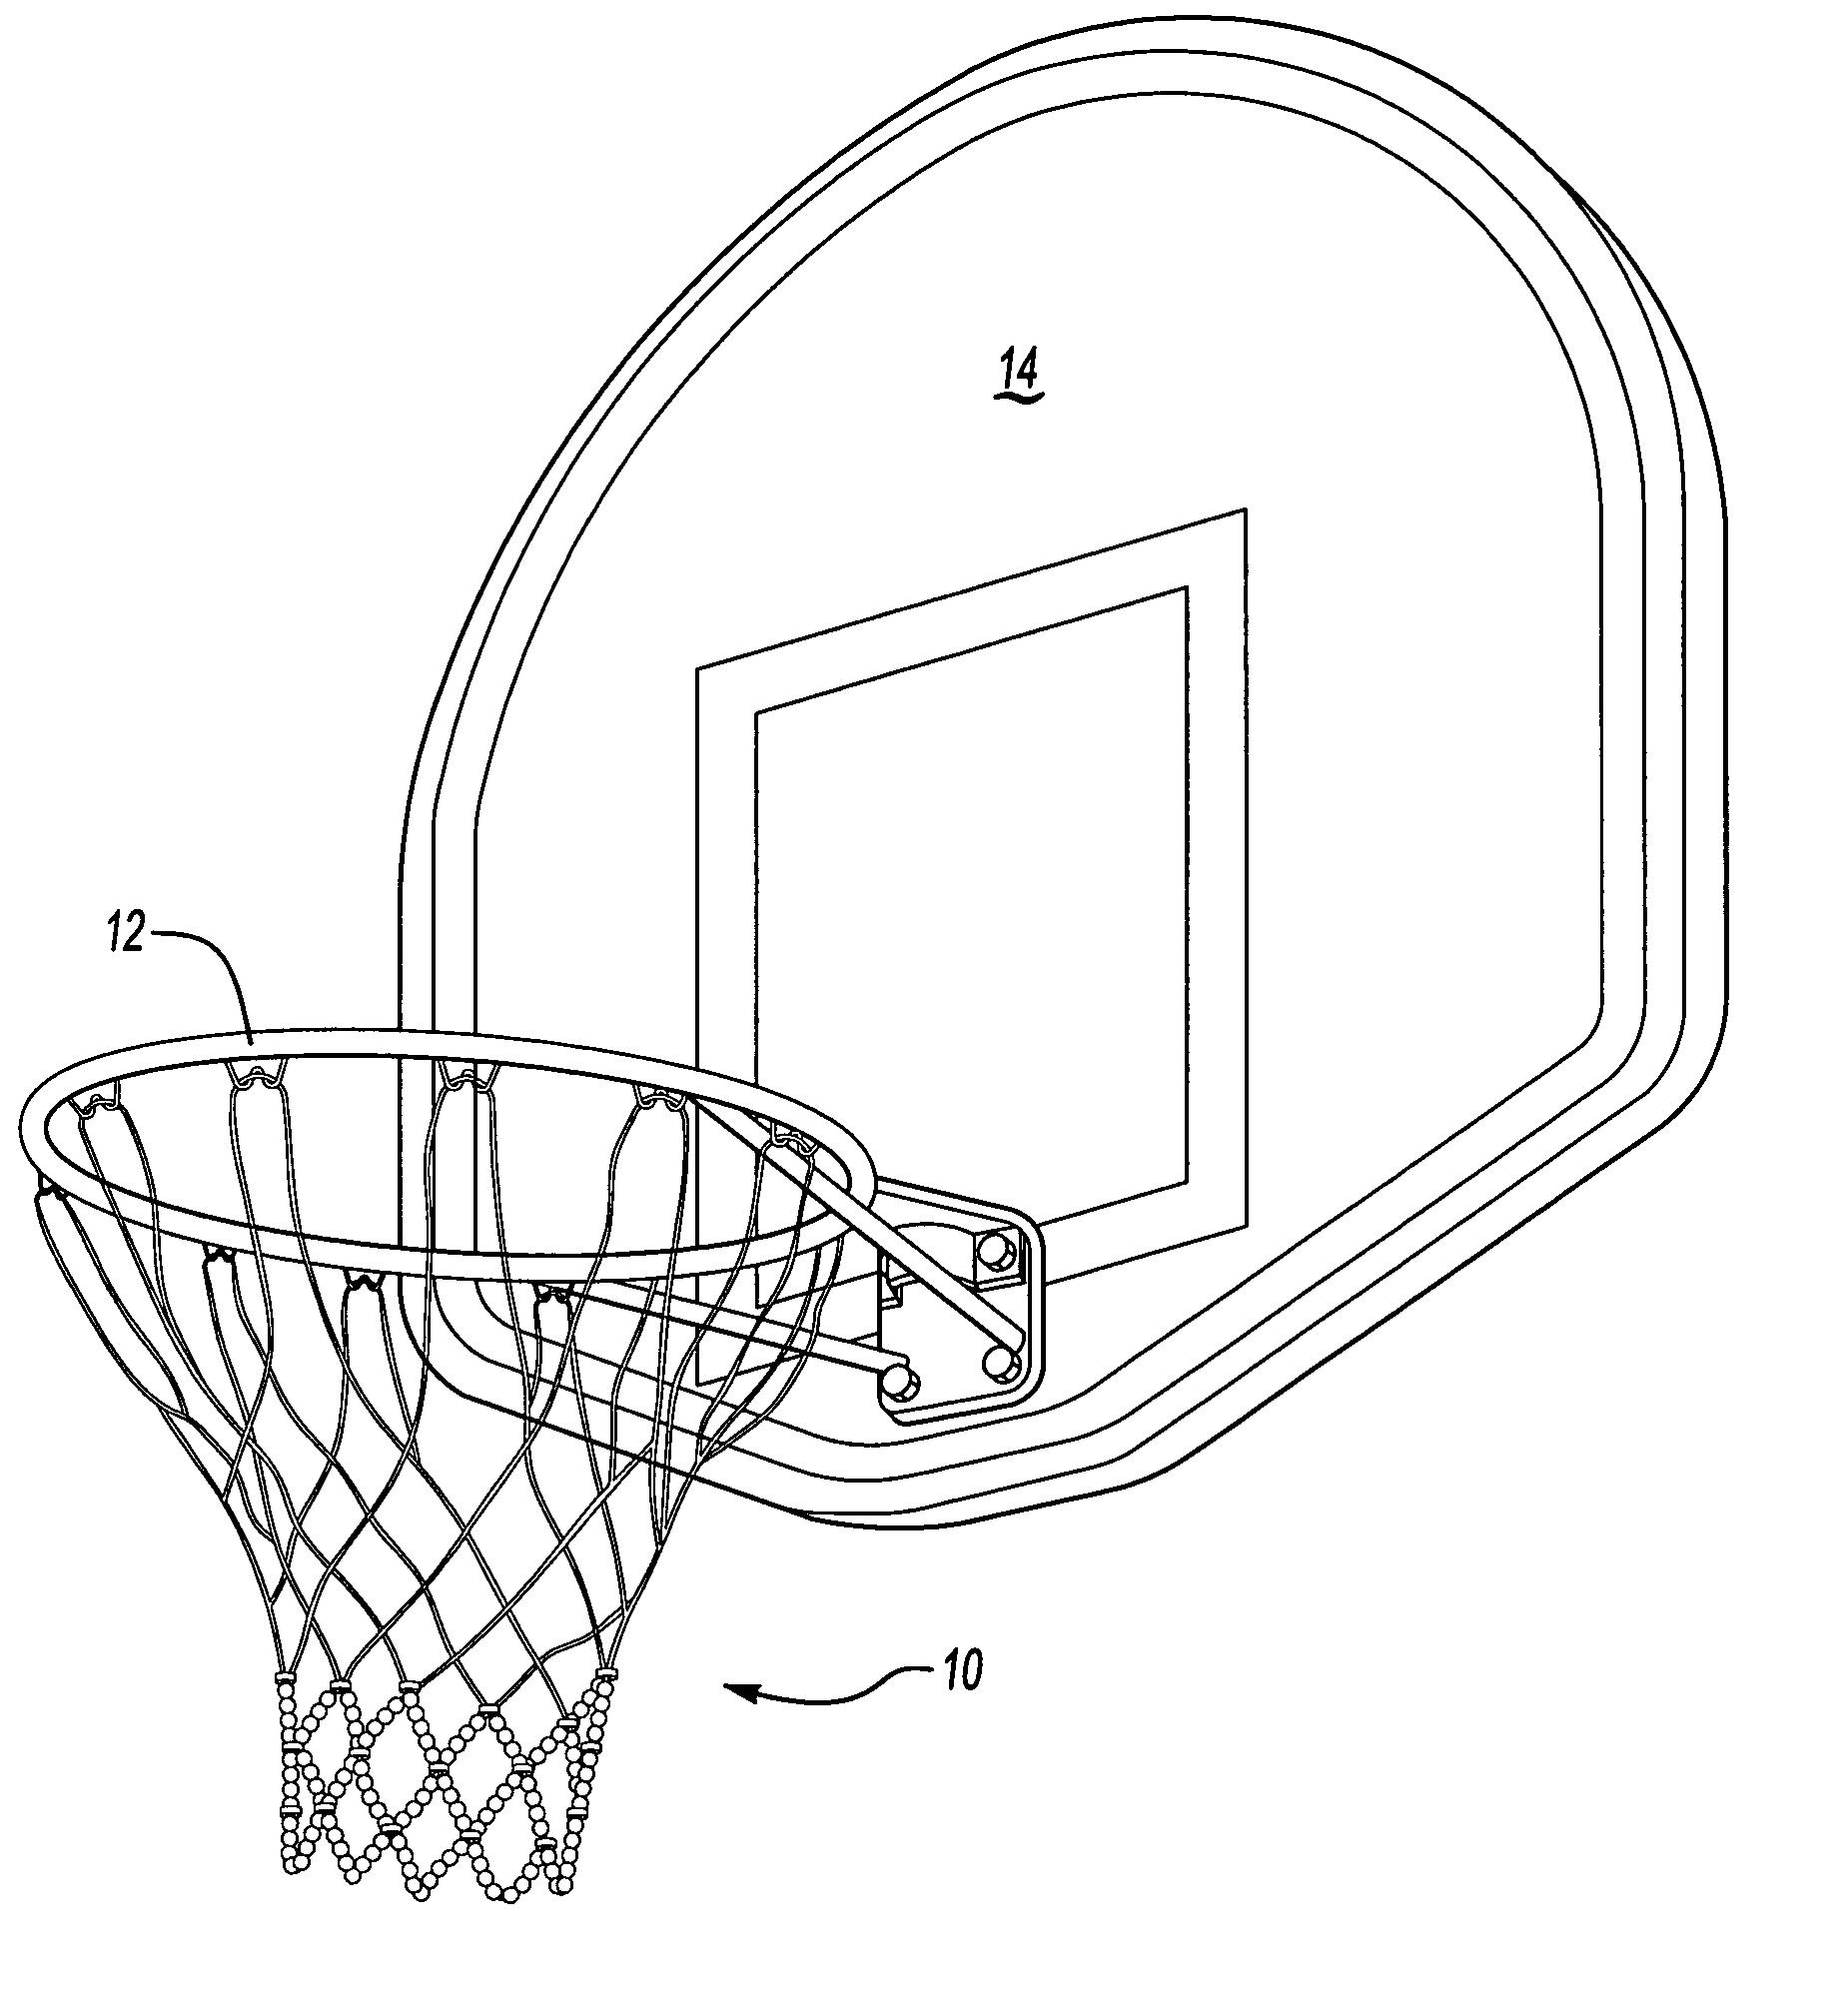 Basketball net sketch